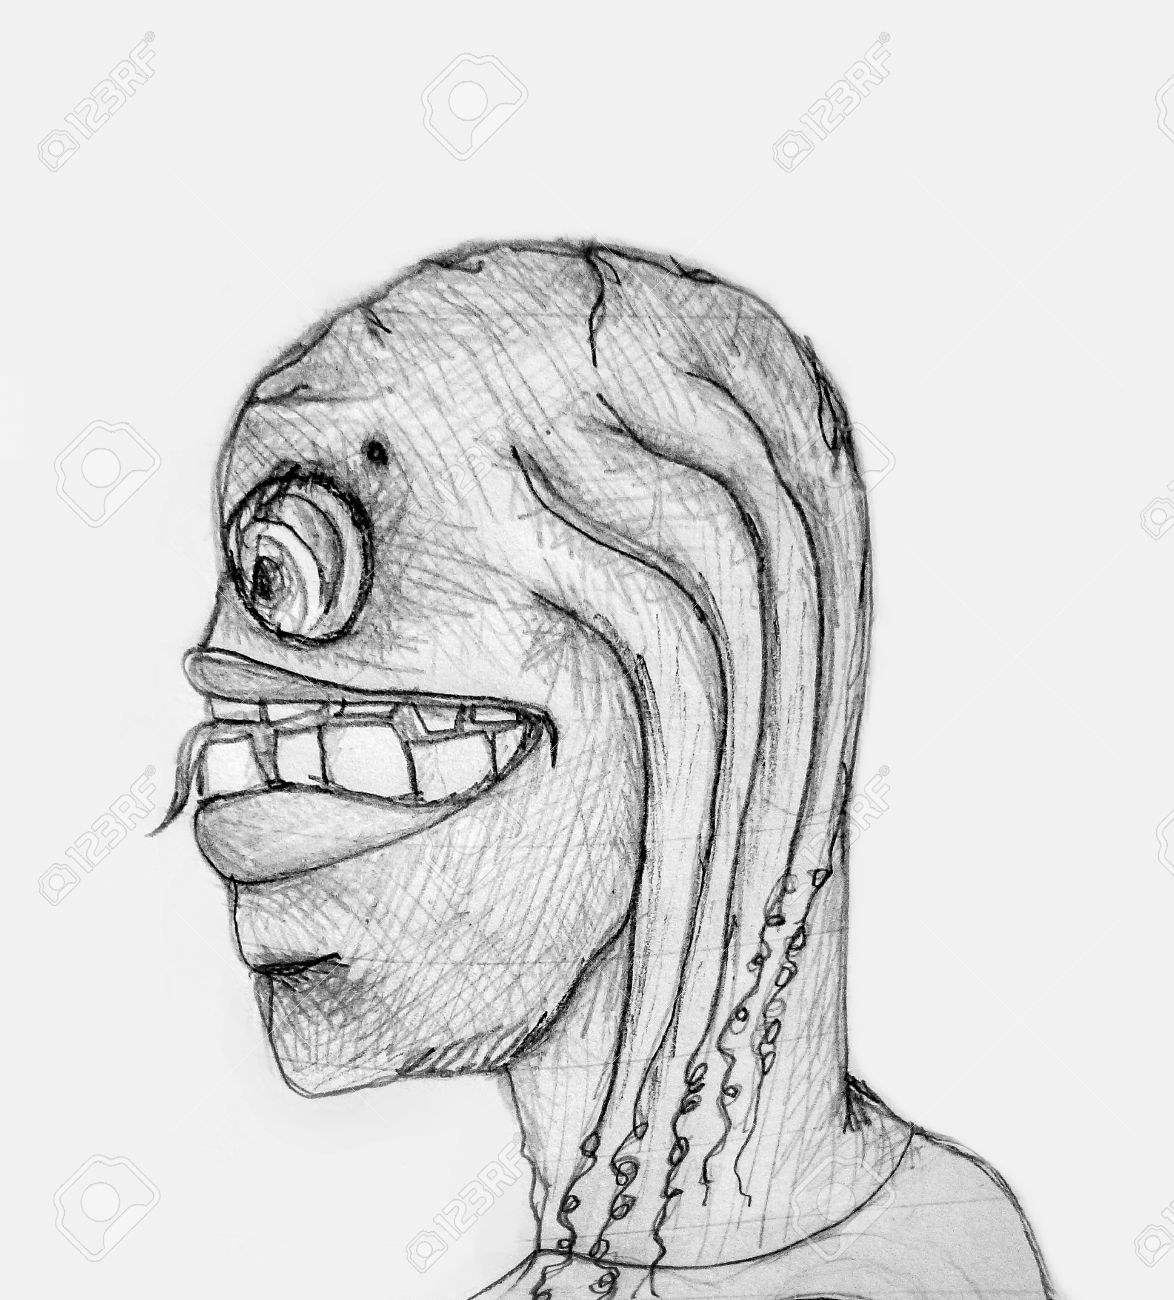 Lápiz Obra Dibujo Que Representa A Un Extraño Monstruo Futurista O